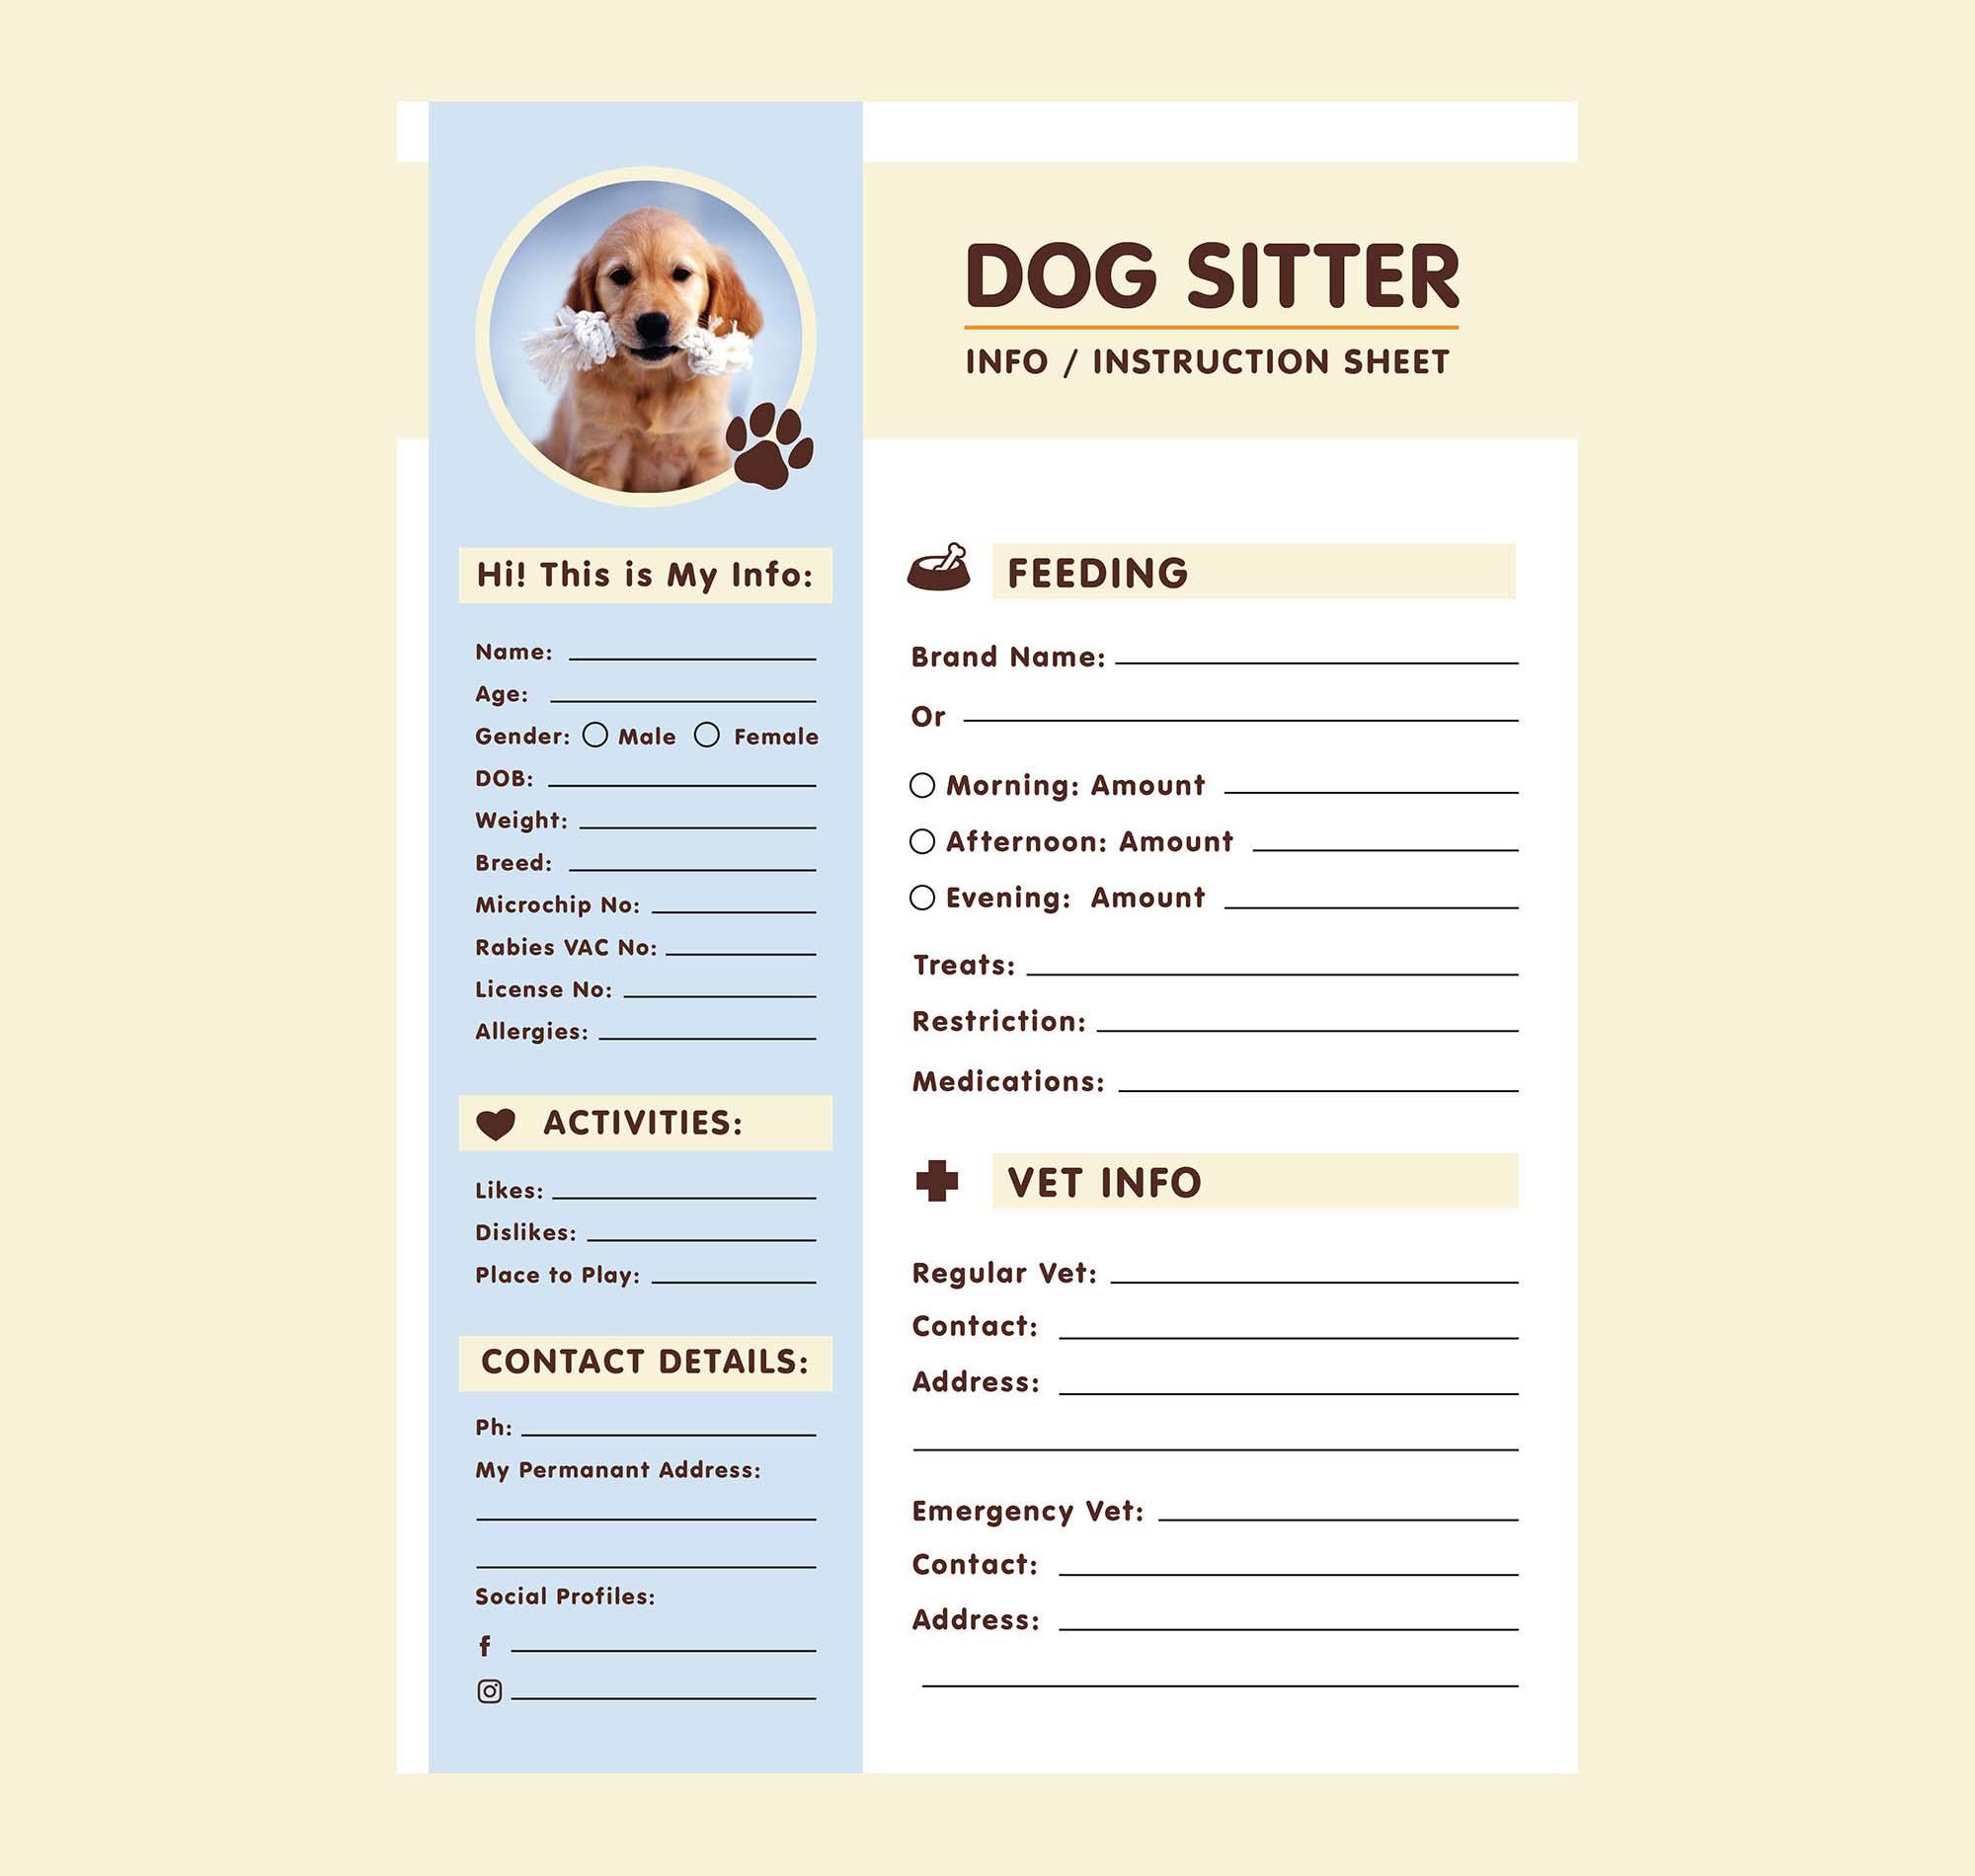 Dog Sitter Information Sheet Template 2